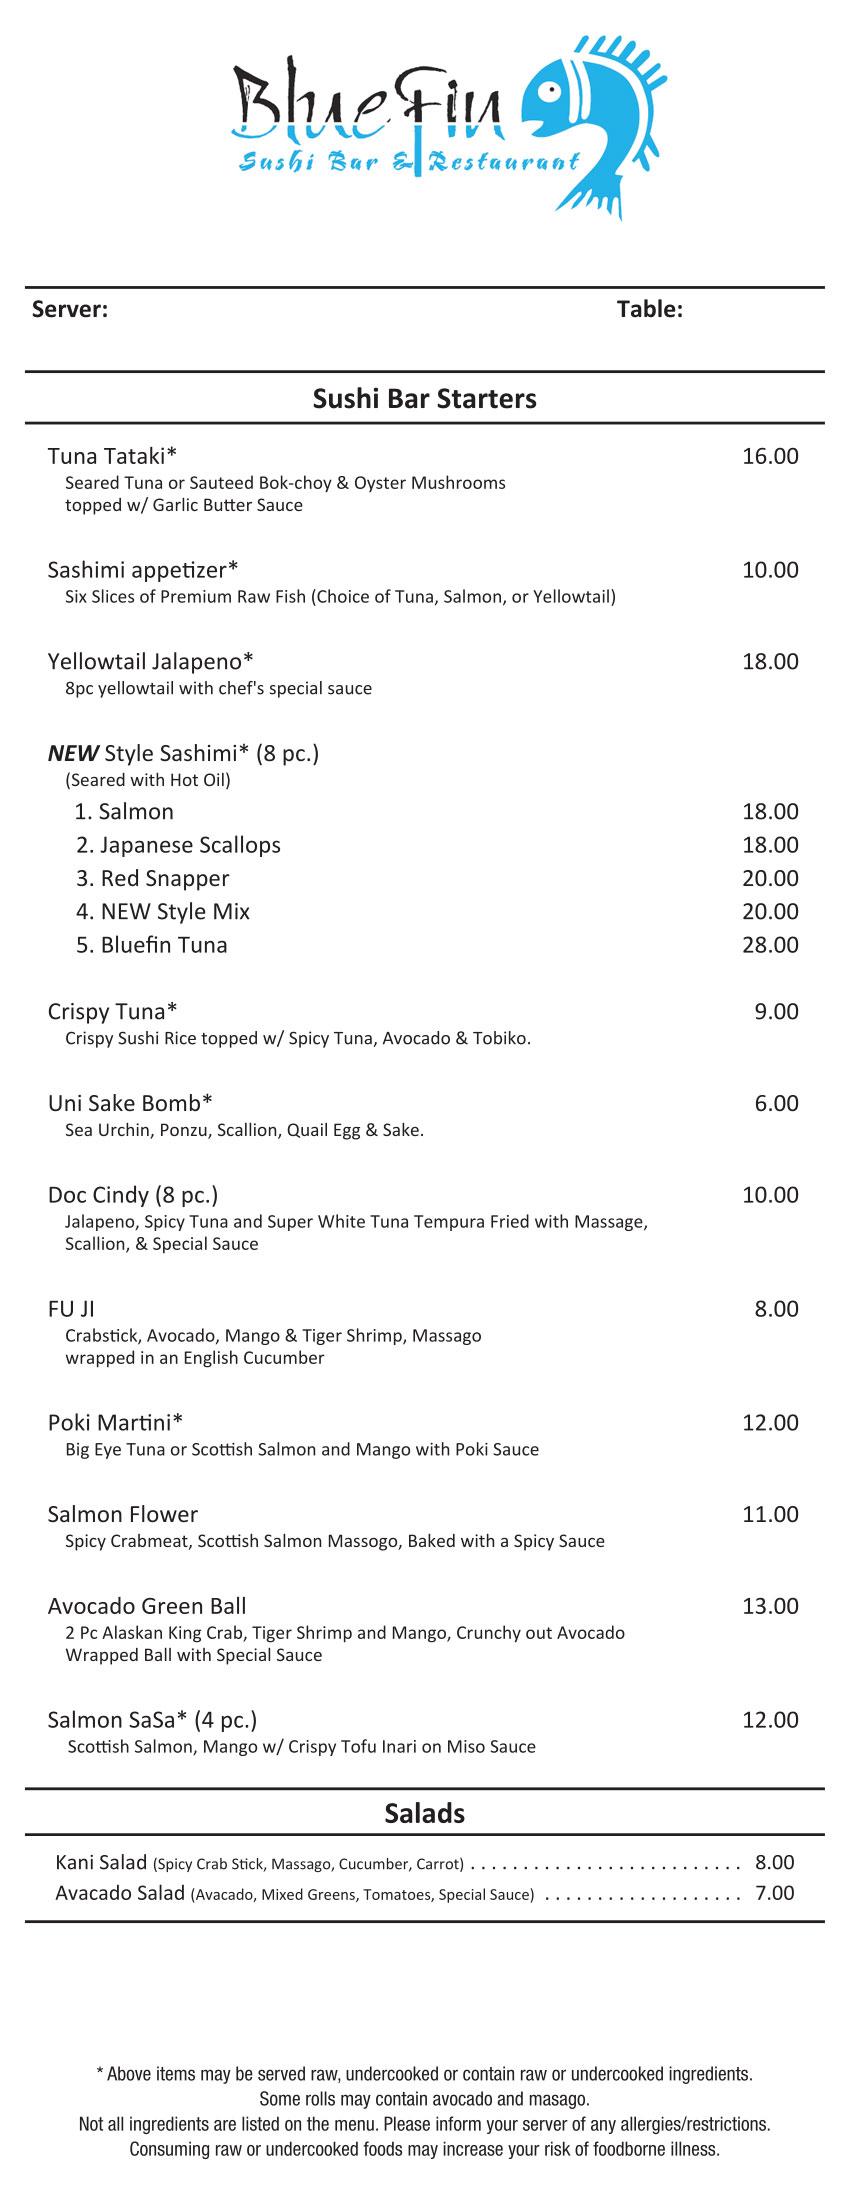 Bluefin-Sushi-Regular-Menu-Proof2-2